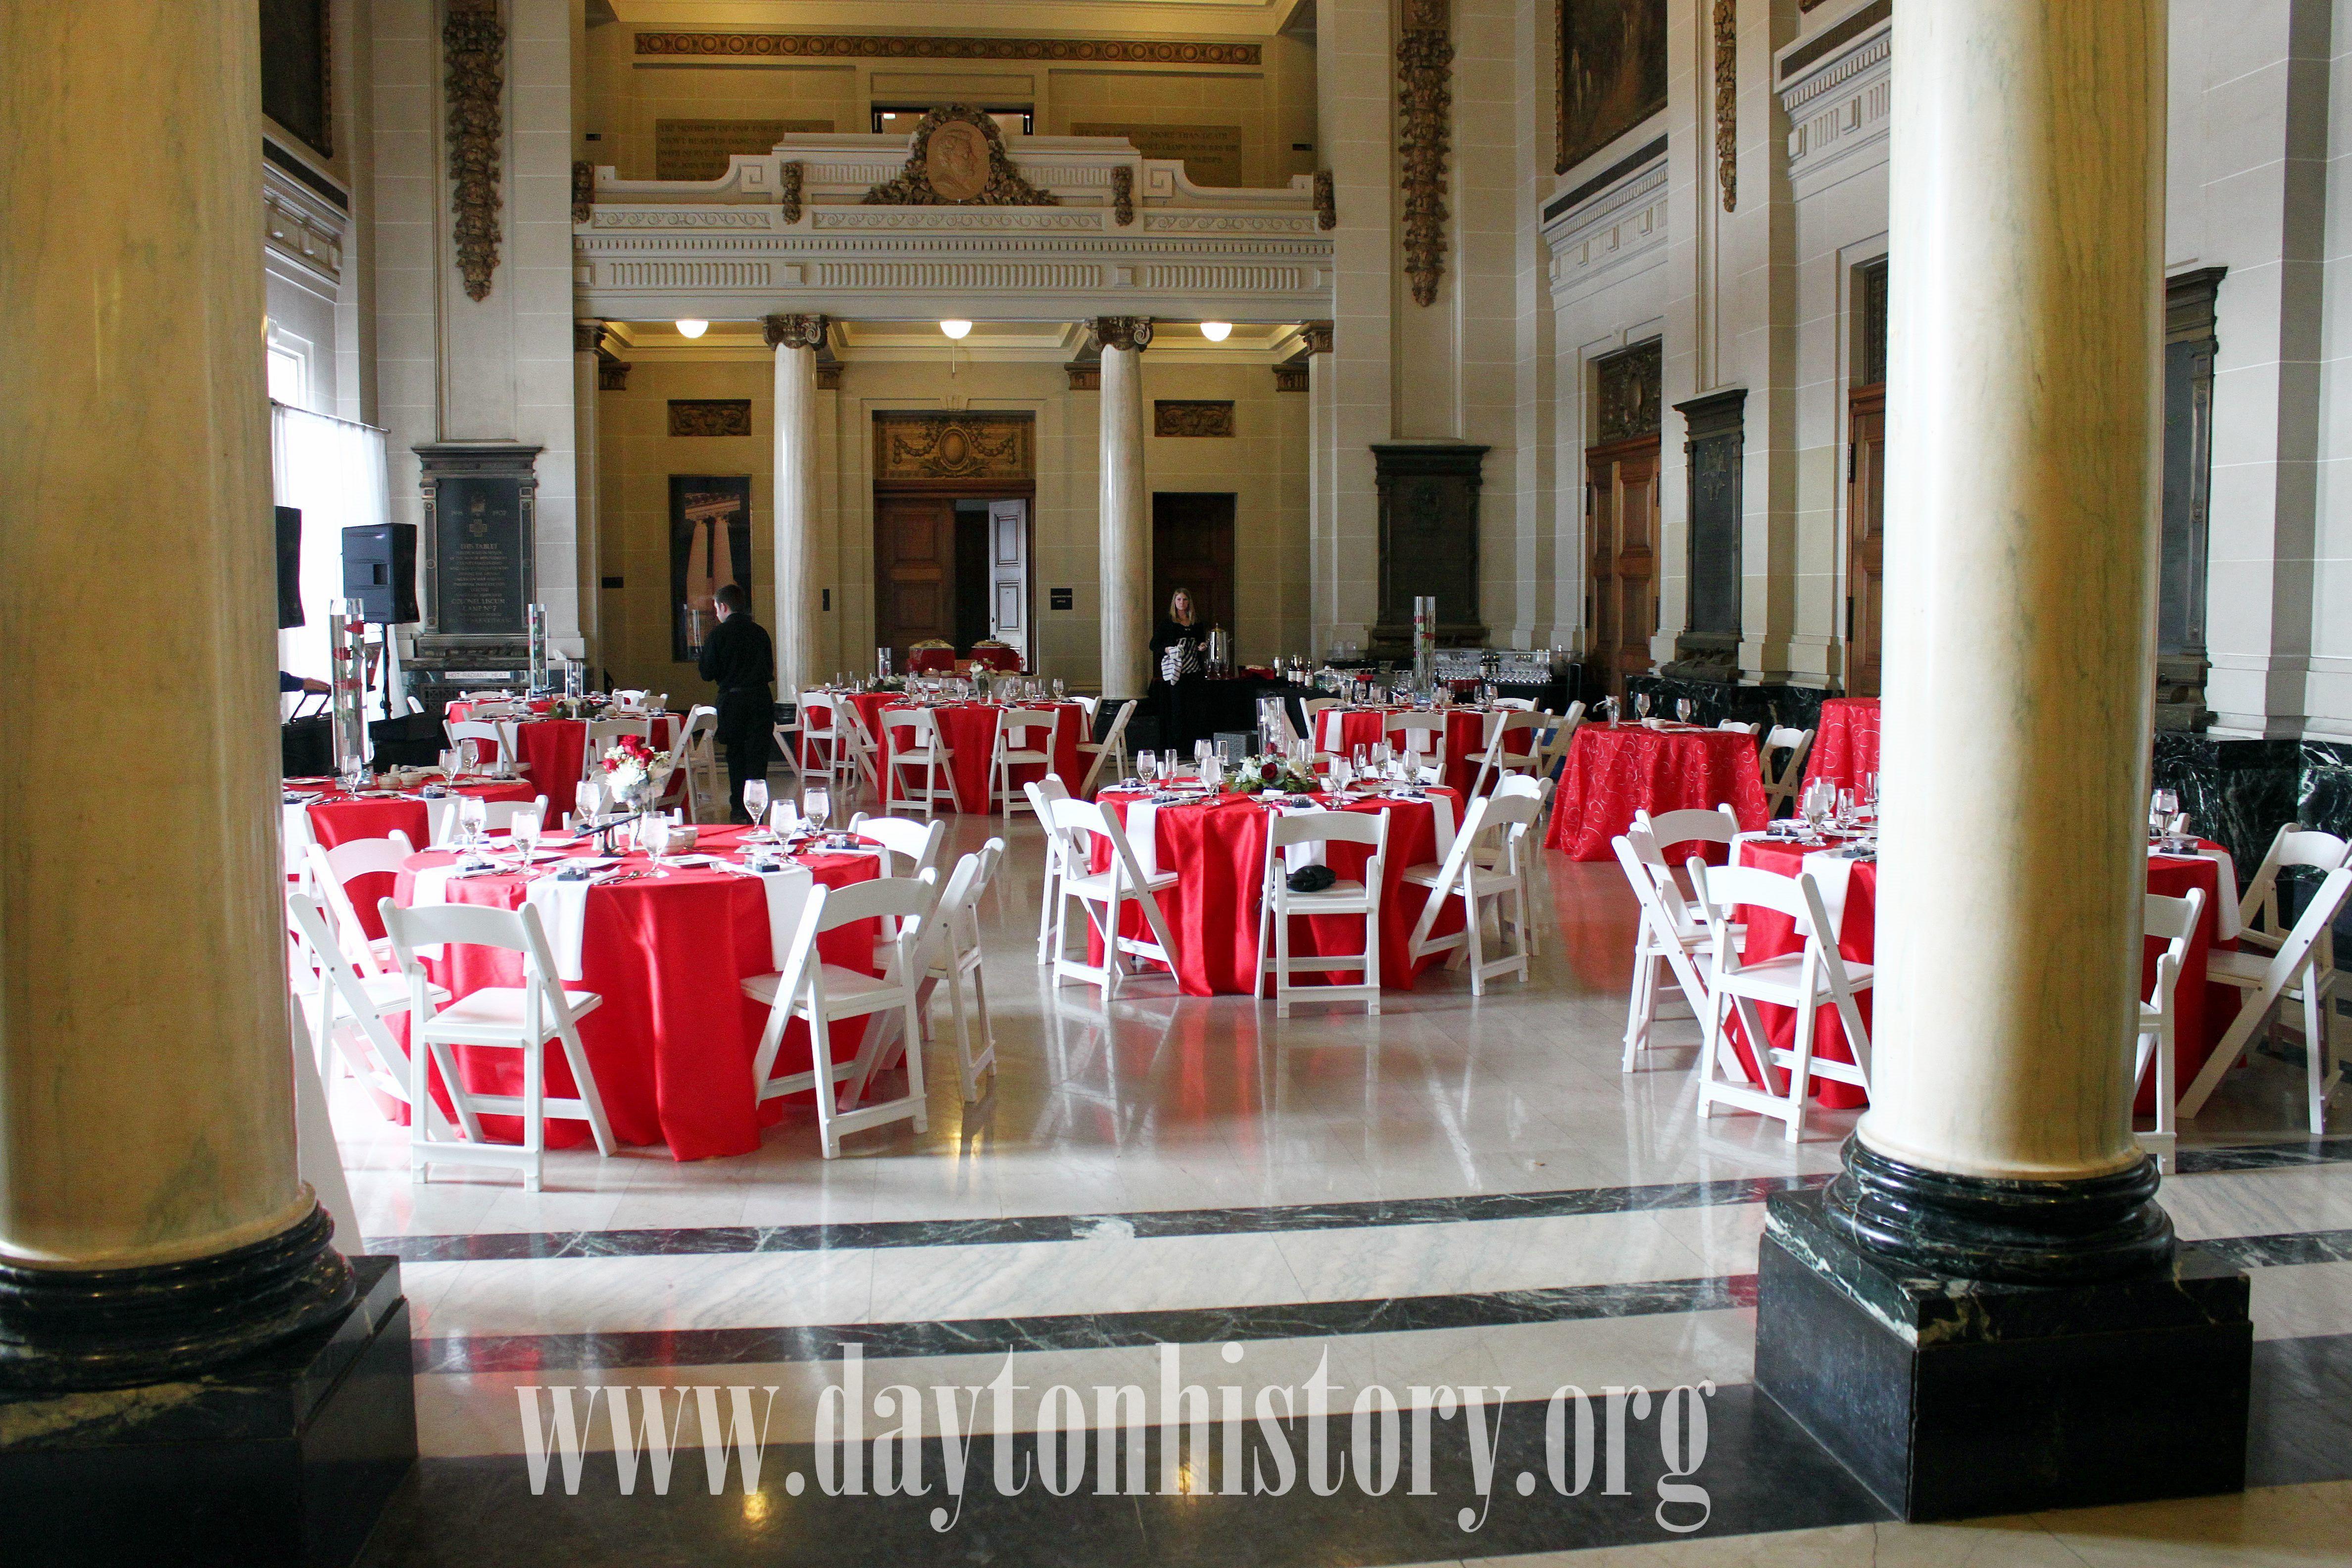 Wedding Reception At Memorial Hall, Dayton, Ohio, 60